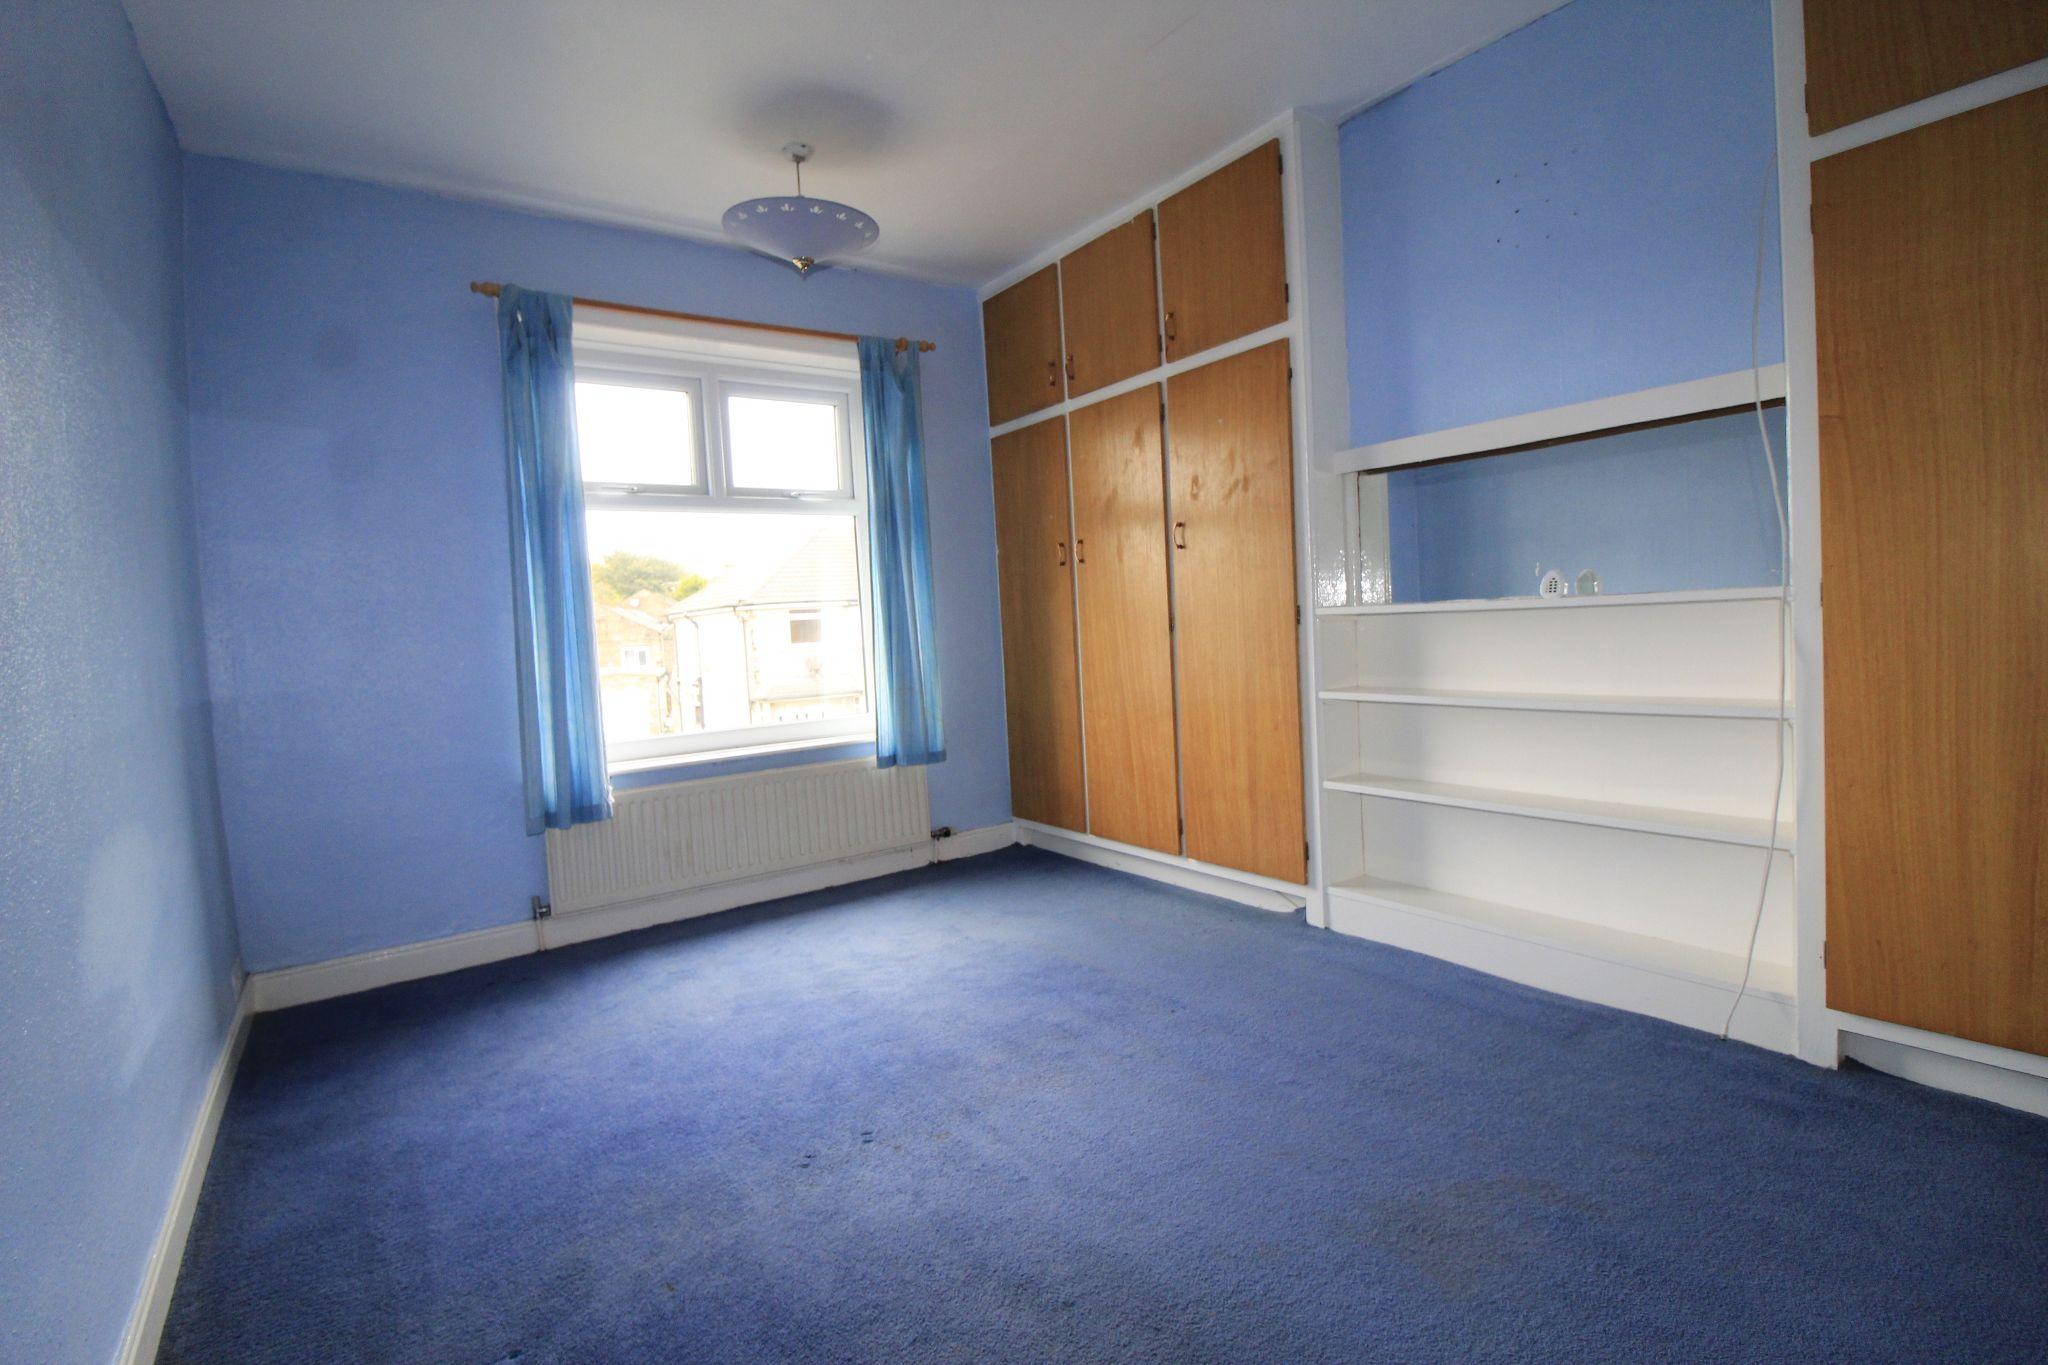 3 bedroom end terraced house To Let in Bradford - Bedroom 2